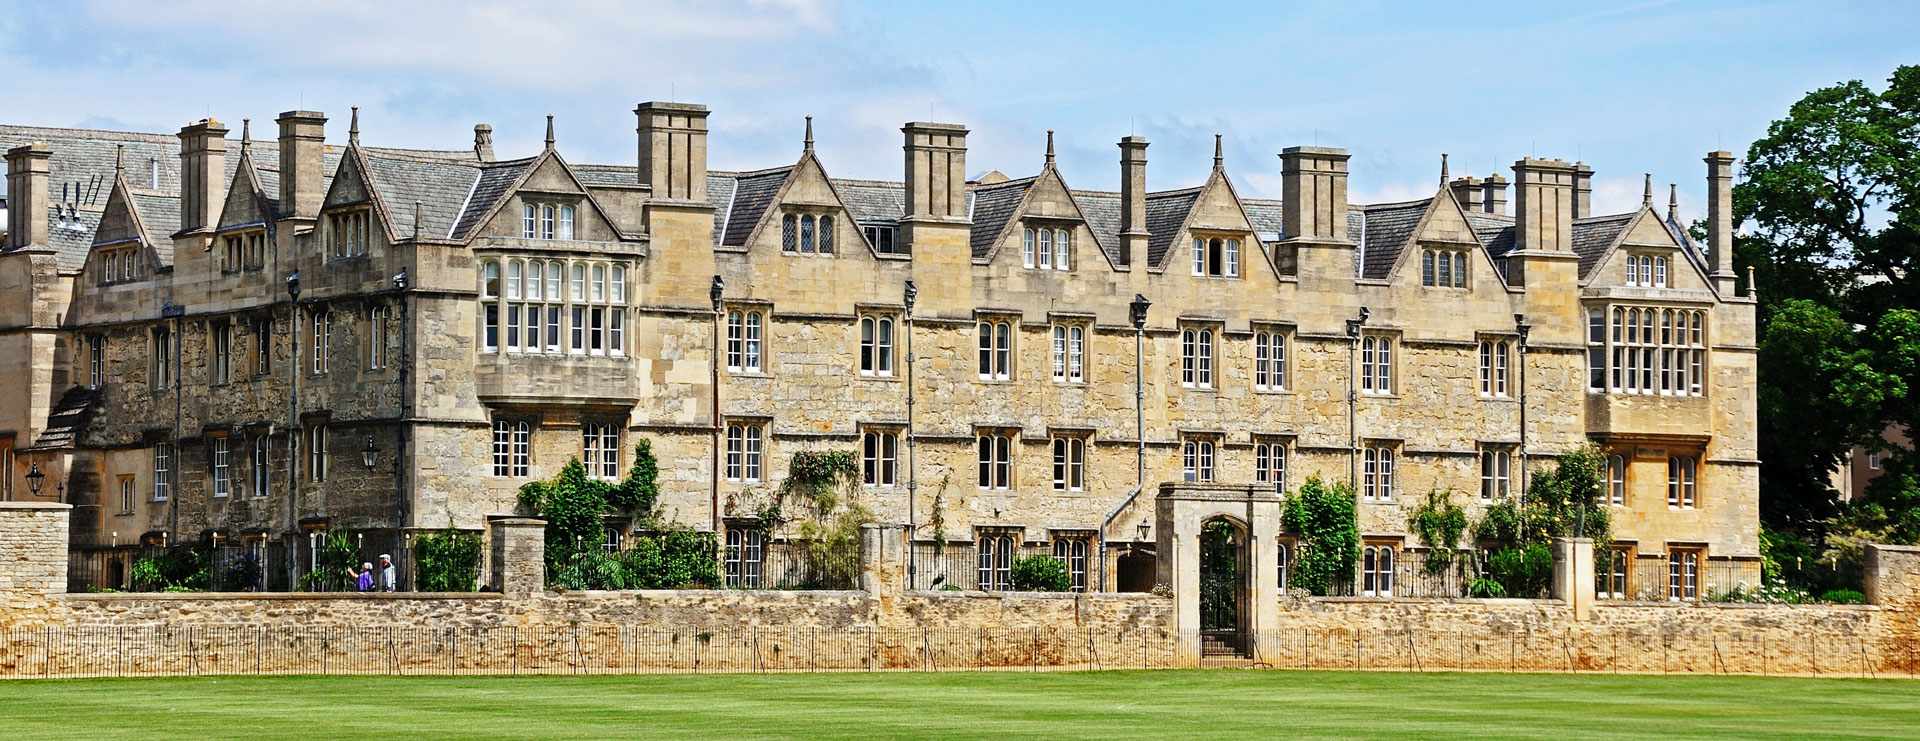 Private Education - Oxford University